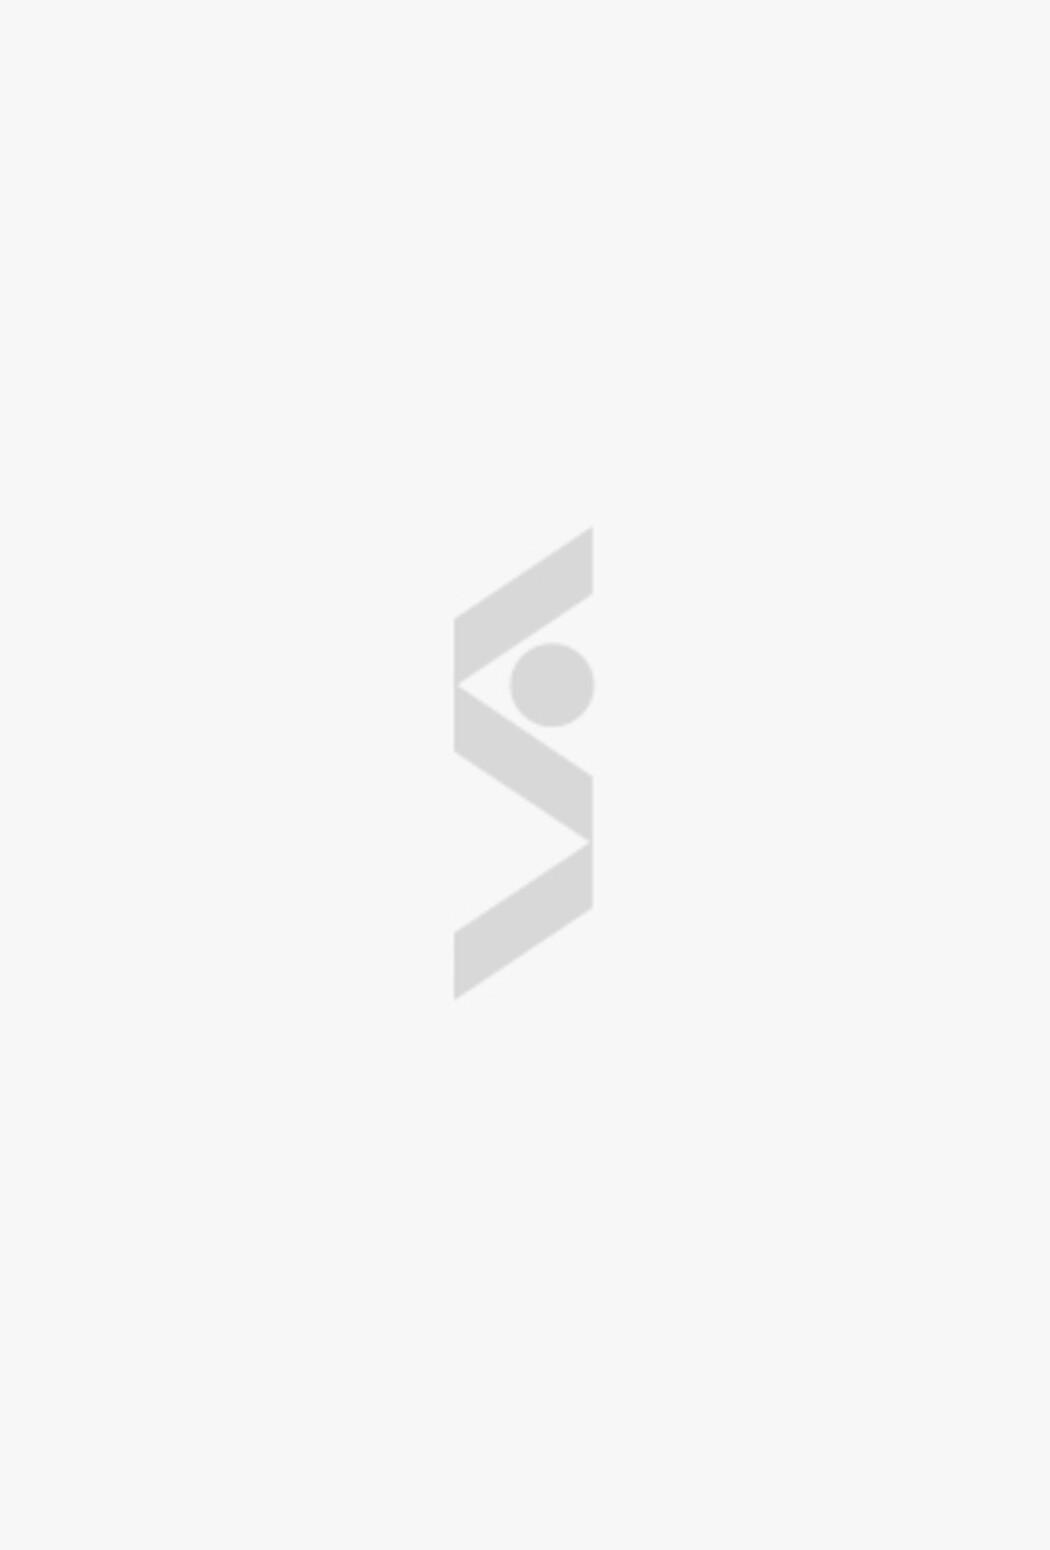 Рюкзак из экокожи на молнии Tommy Hilfiger - цена  ₽ купить в интернет-магазине СТОКМАНН в Москве BAFC85AF-910D-4DEB-A33F-6FEB126D97E3